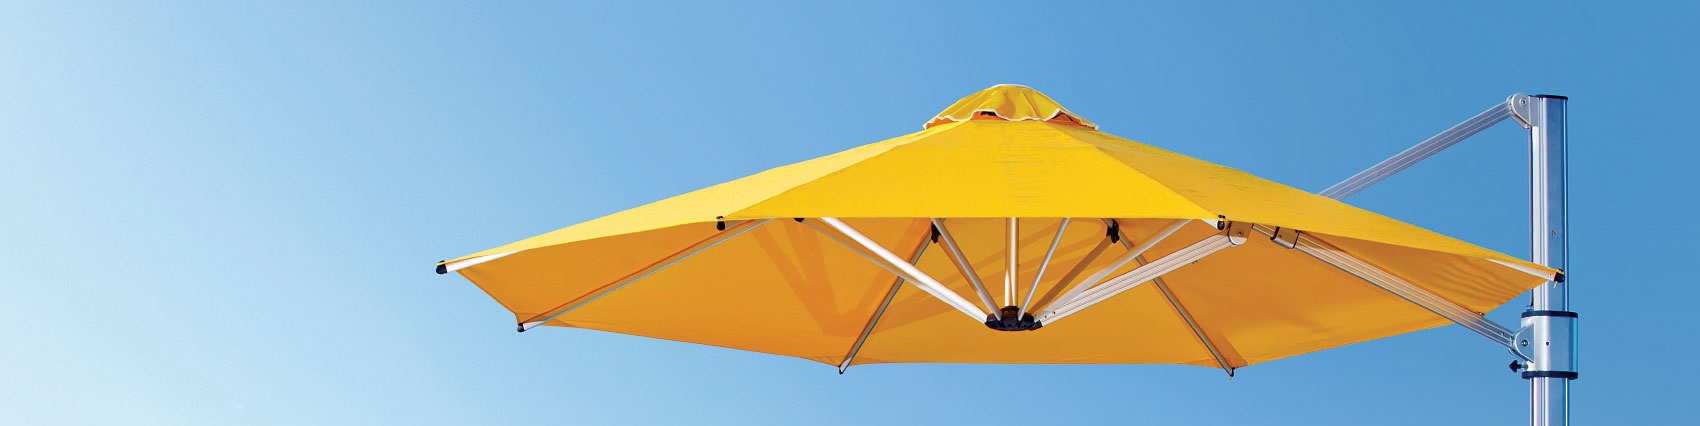 Patio Umbrellas by Offenbachers Home Escapes